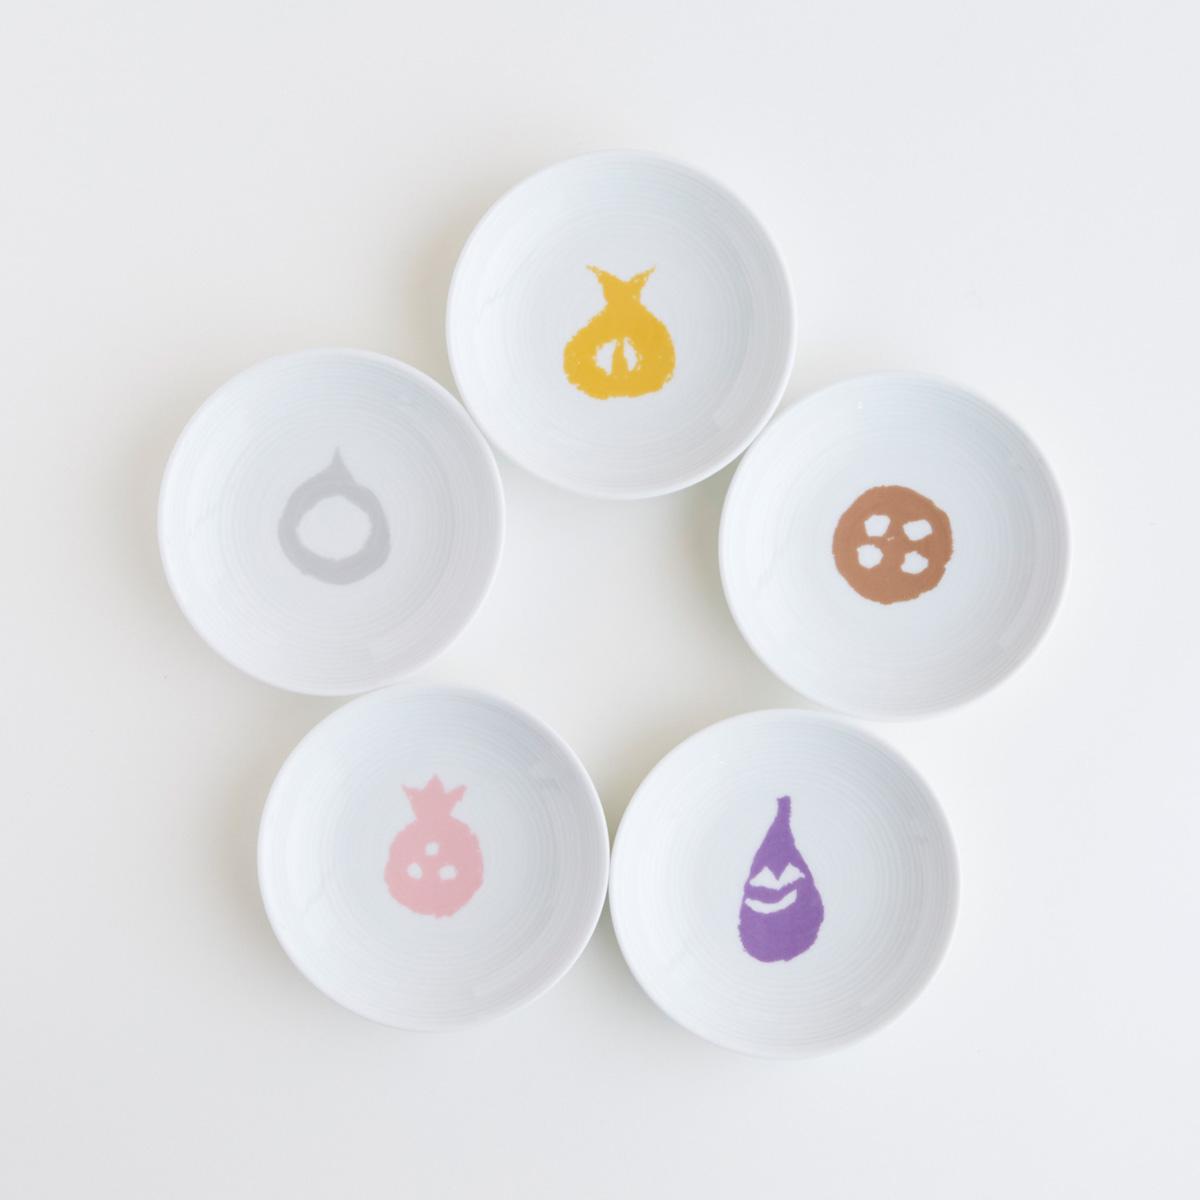 POOL「コロコロのもの 小皿5枚セット」柚木沙弥郎 ¥2,750